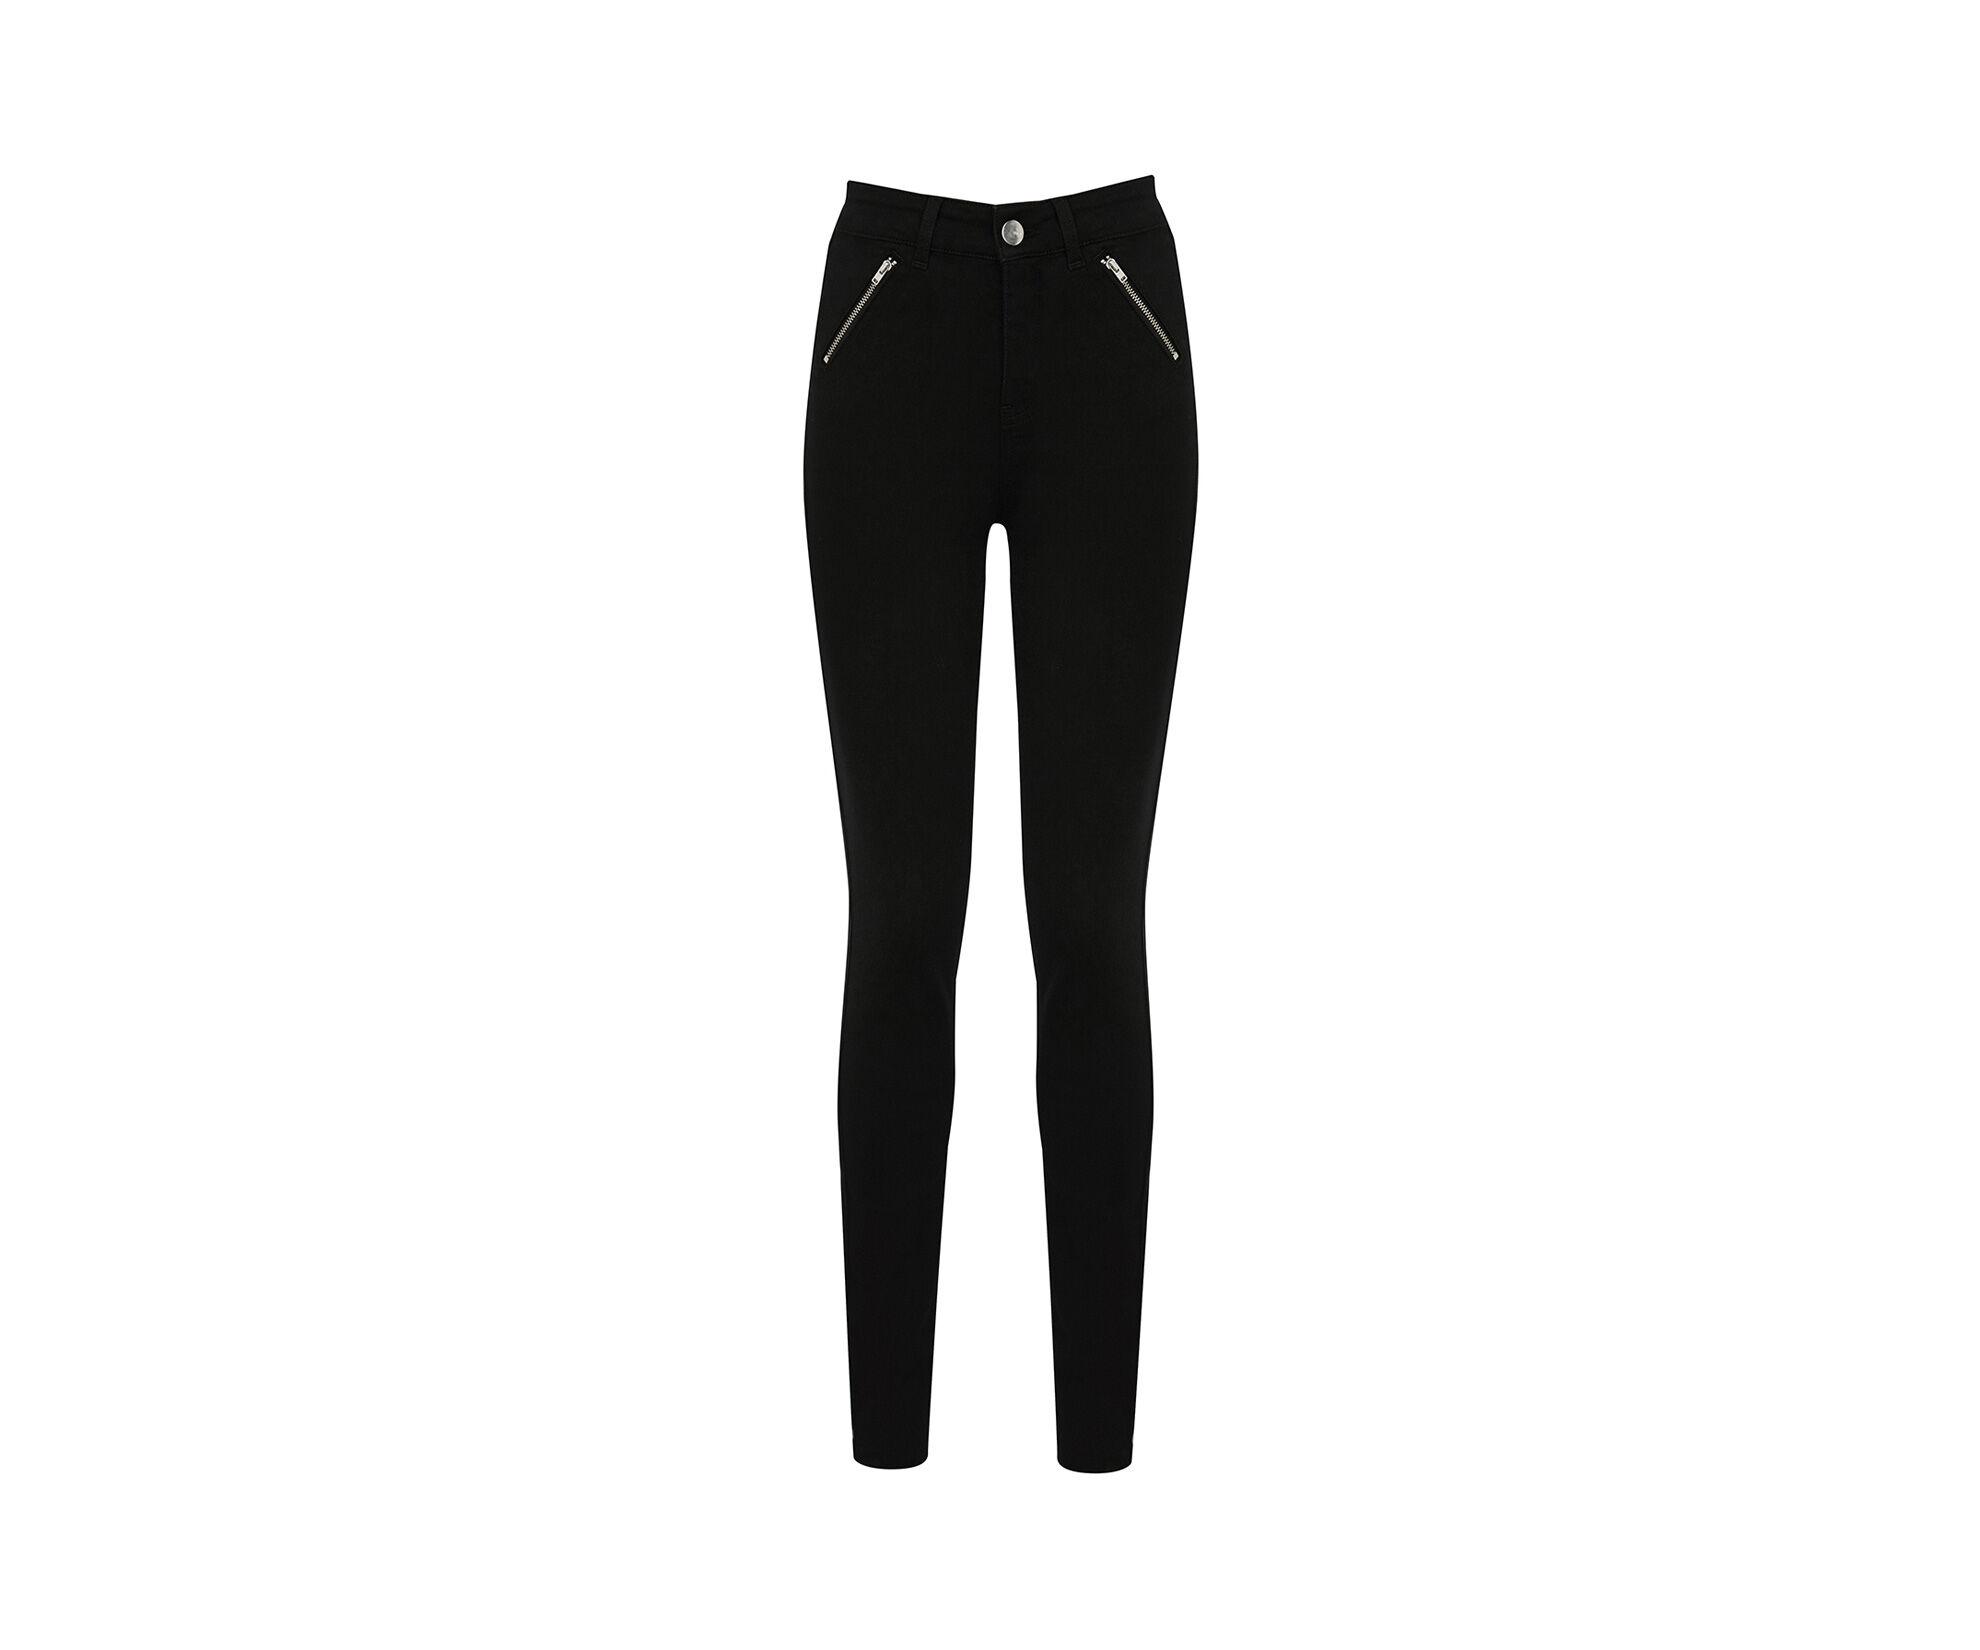 Oasis, Jade High-Waisted Biker Jeans Black 0